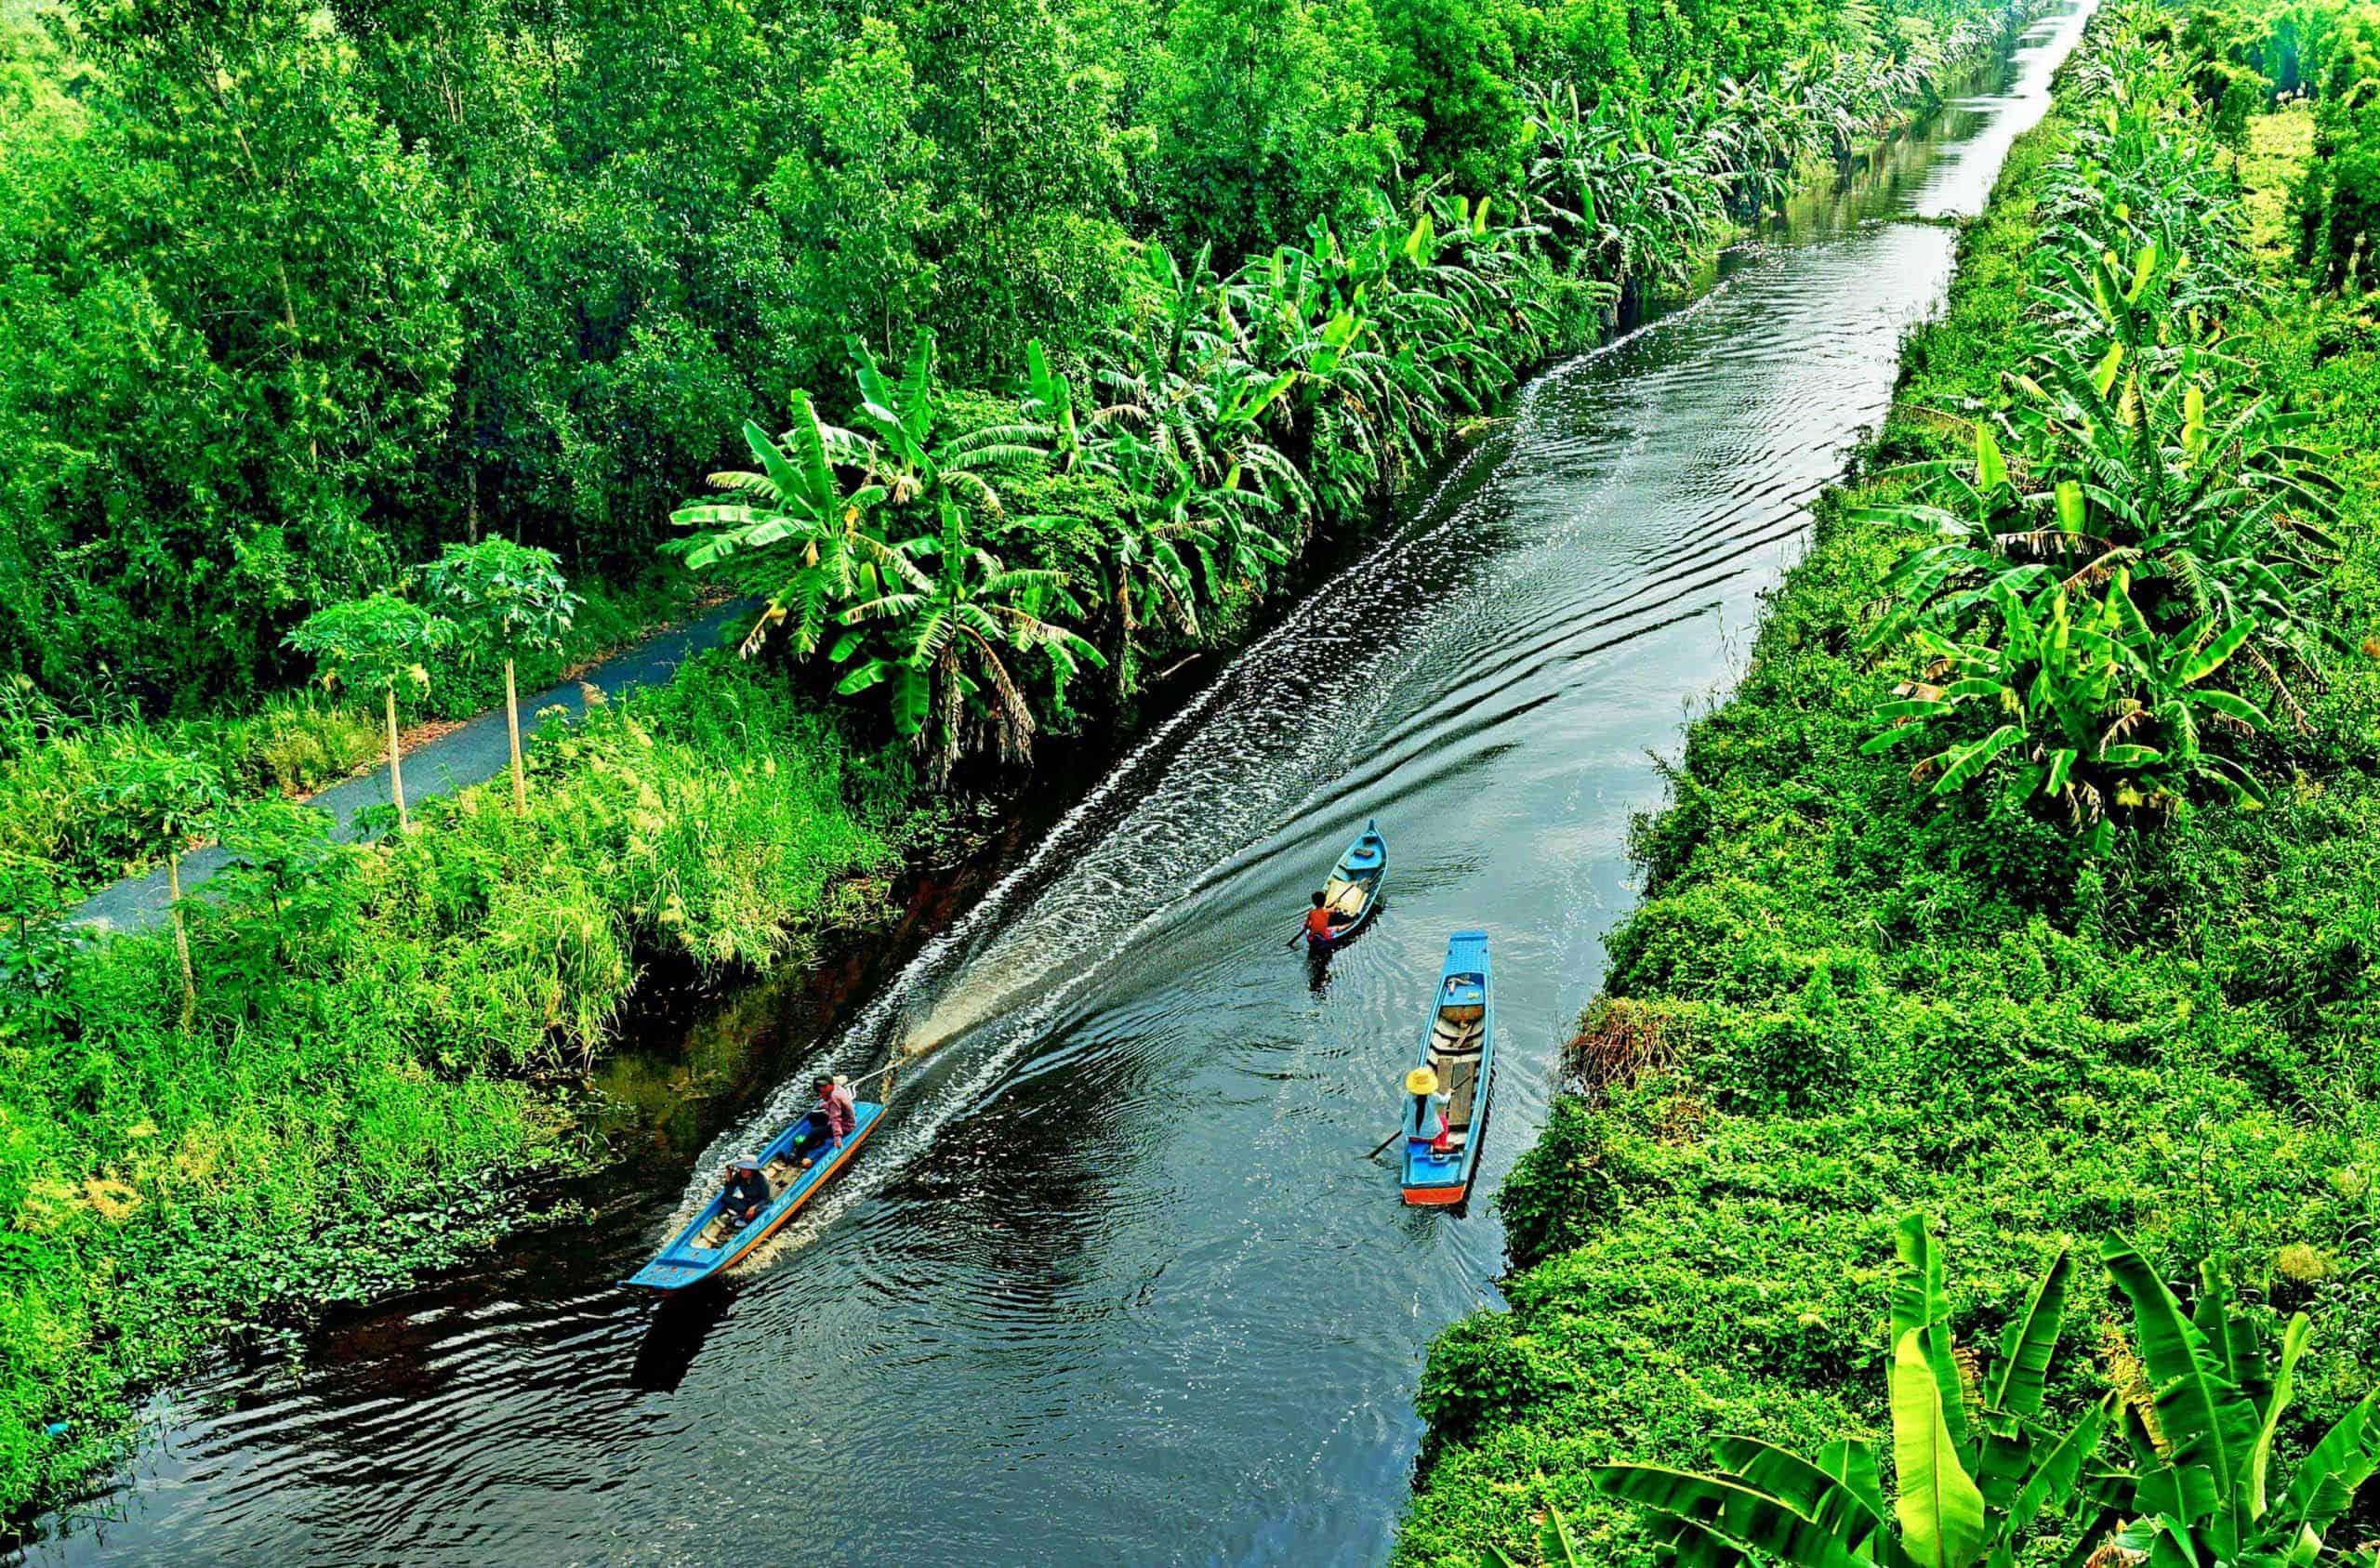 Ca Mau - Mekong Delta provinces